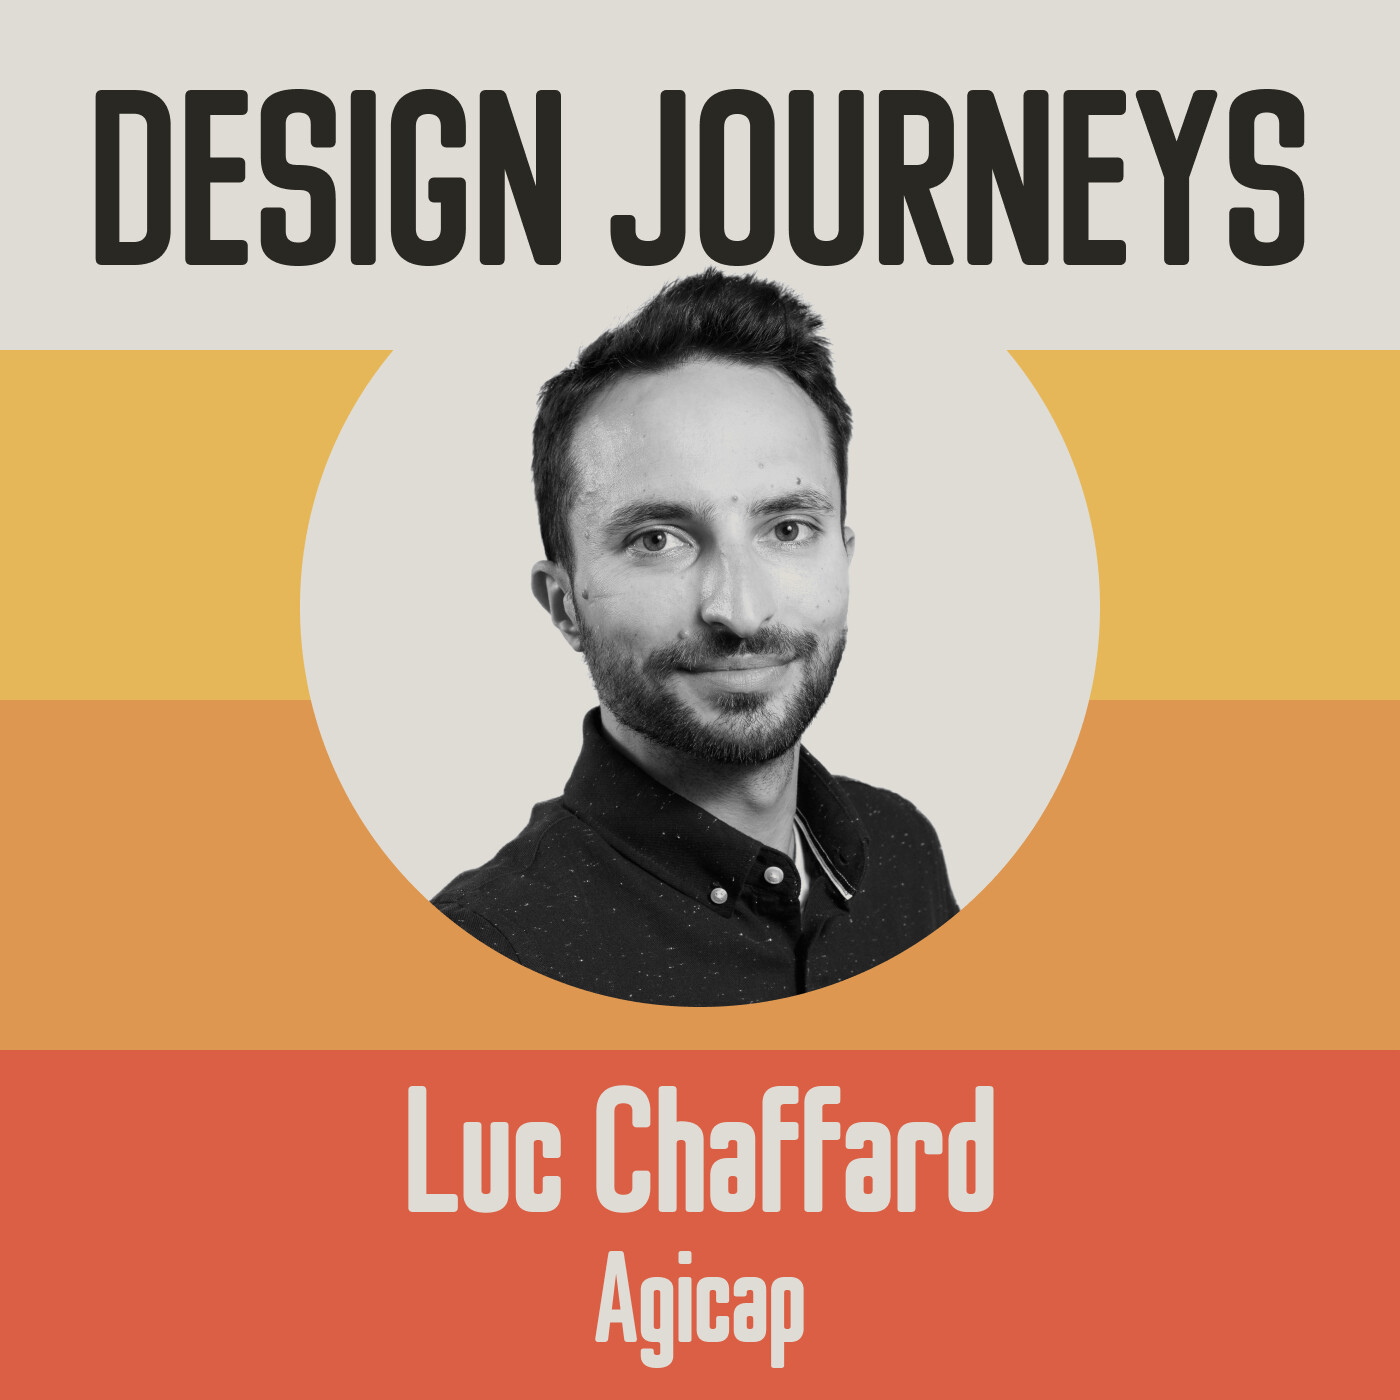 #17 Luc Chaffard - Agicap - Etablir les bases d'une équipe Design